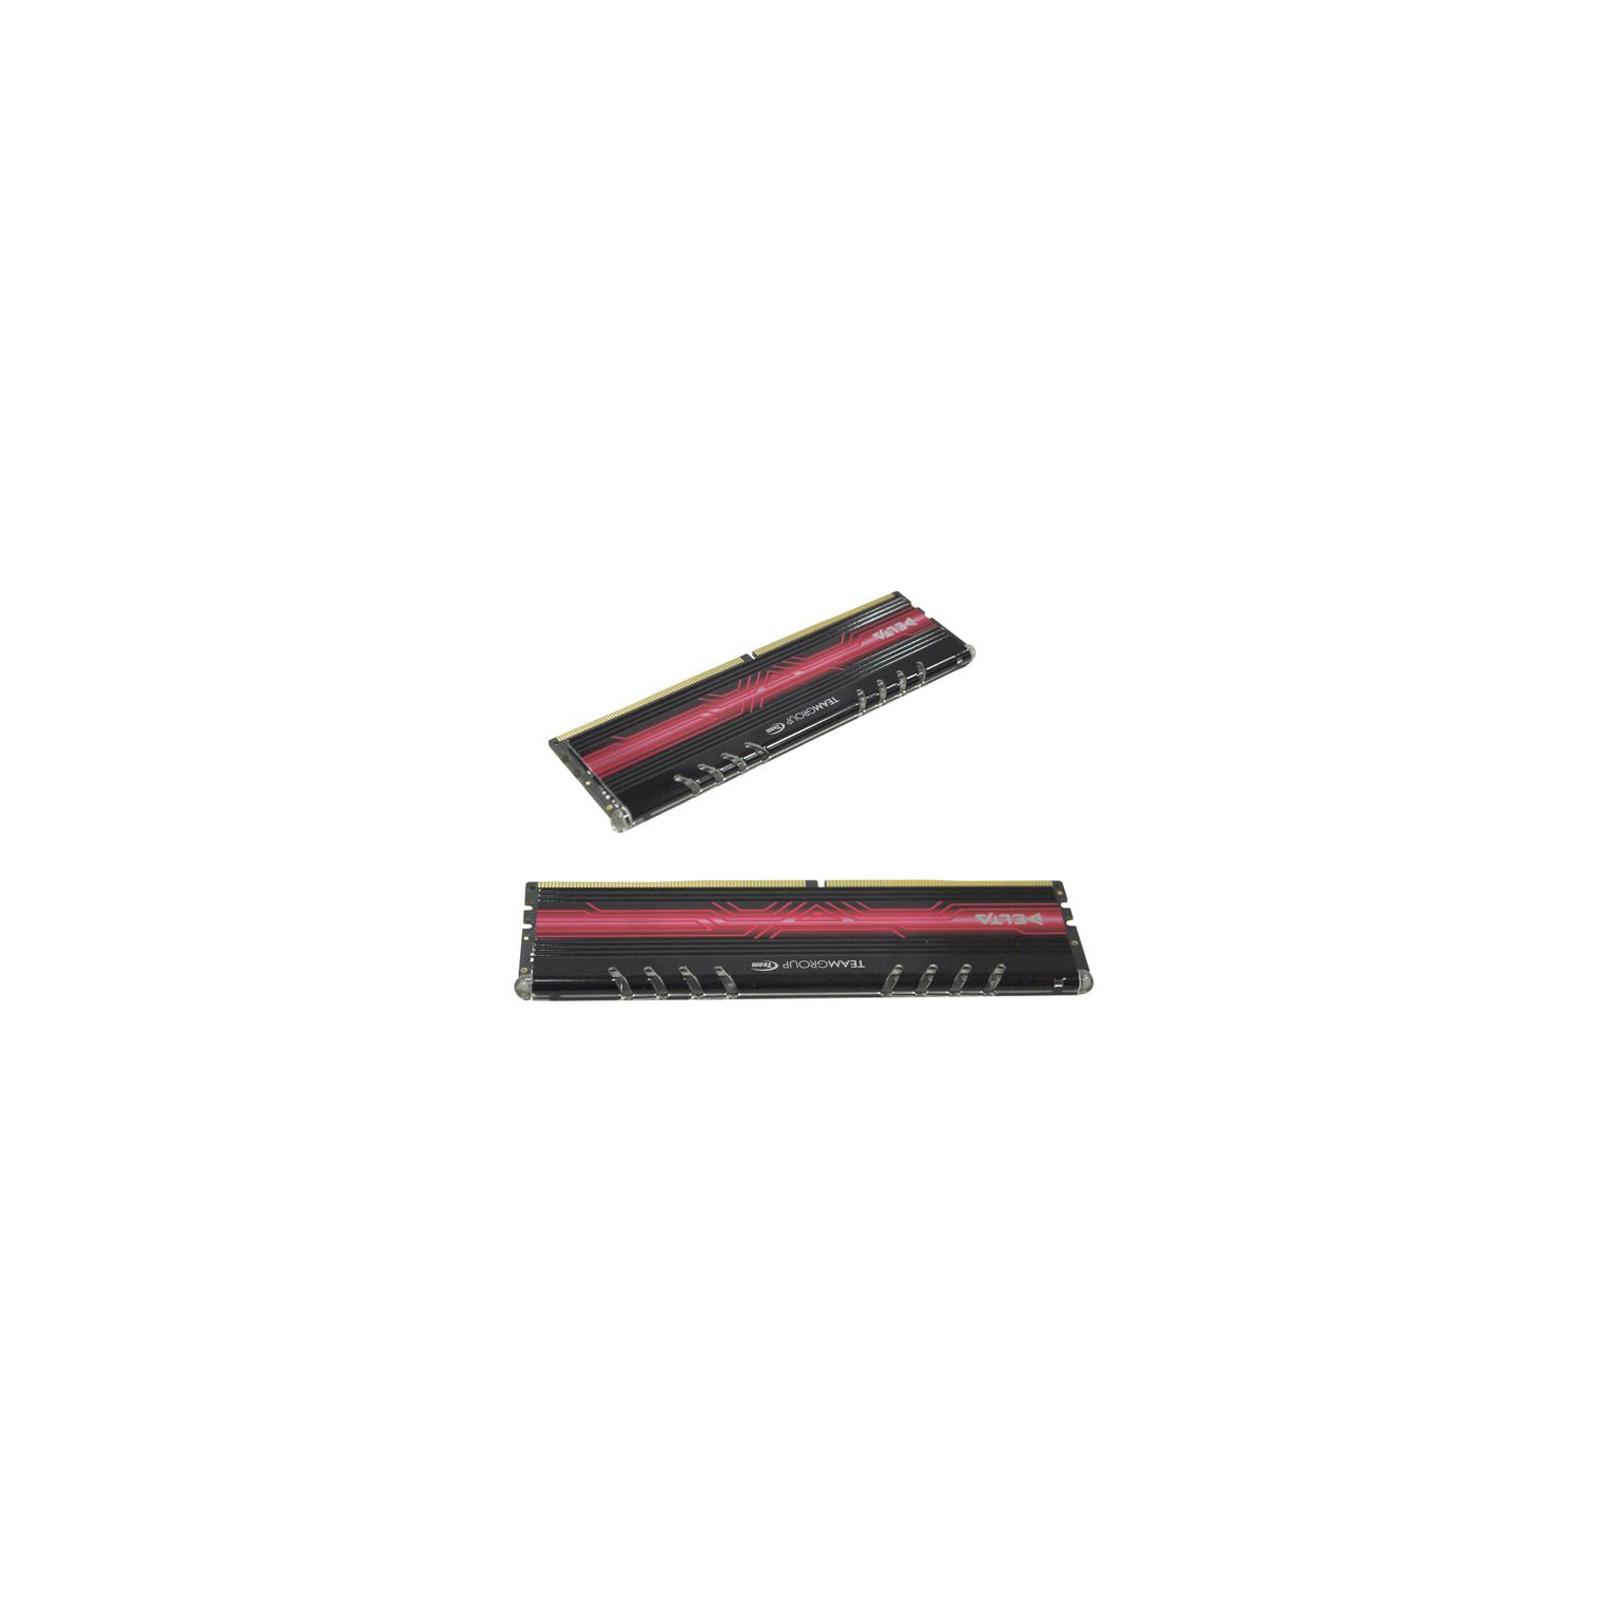 Модуль памяти для компьютера DDR4 16GB (2x8GB) 3000 MHz Delta Red LED Team (TDTRD416G3000HC16ADC01) изображение 2